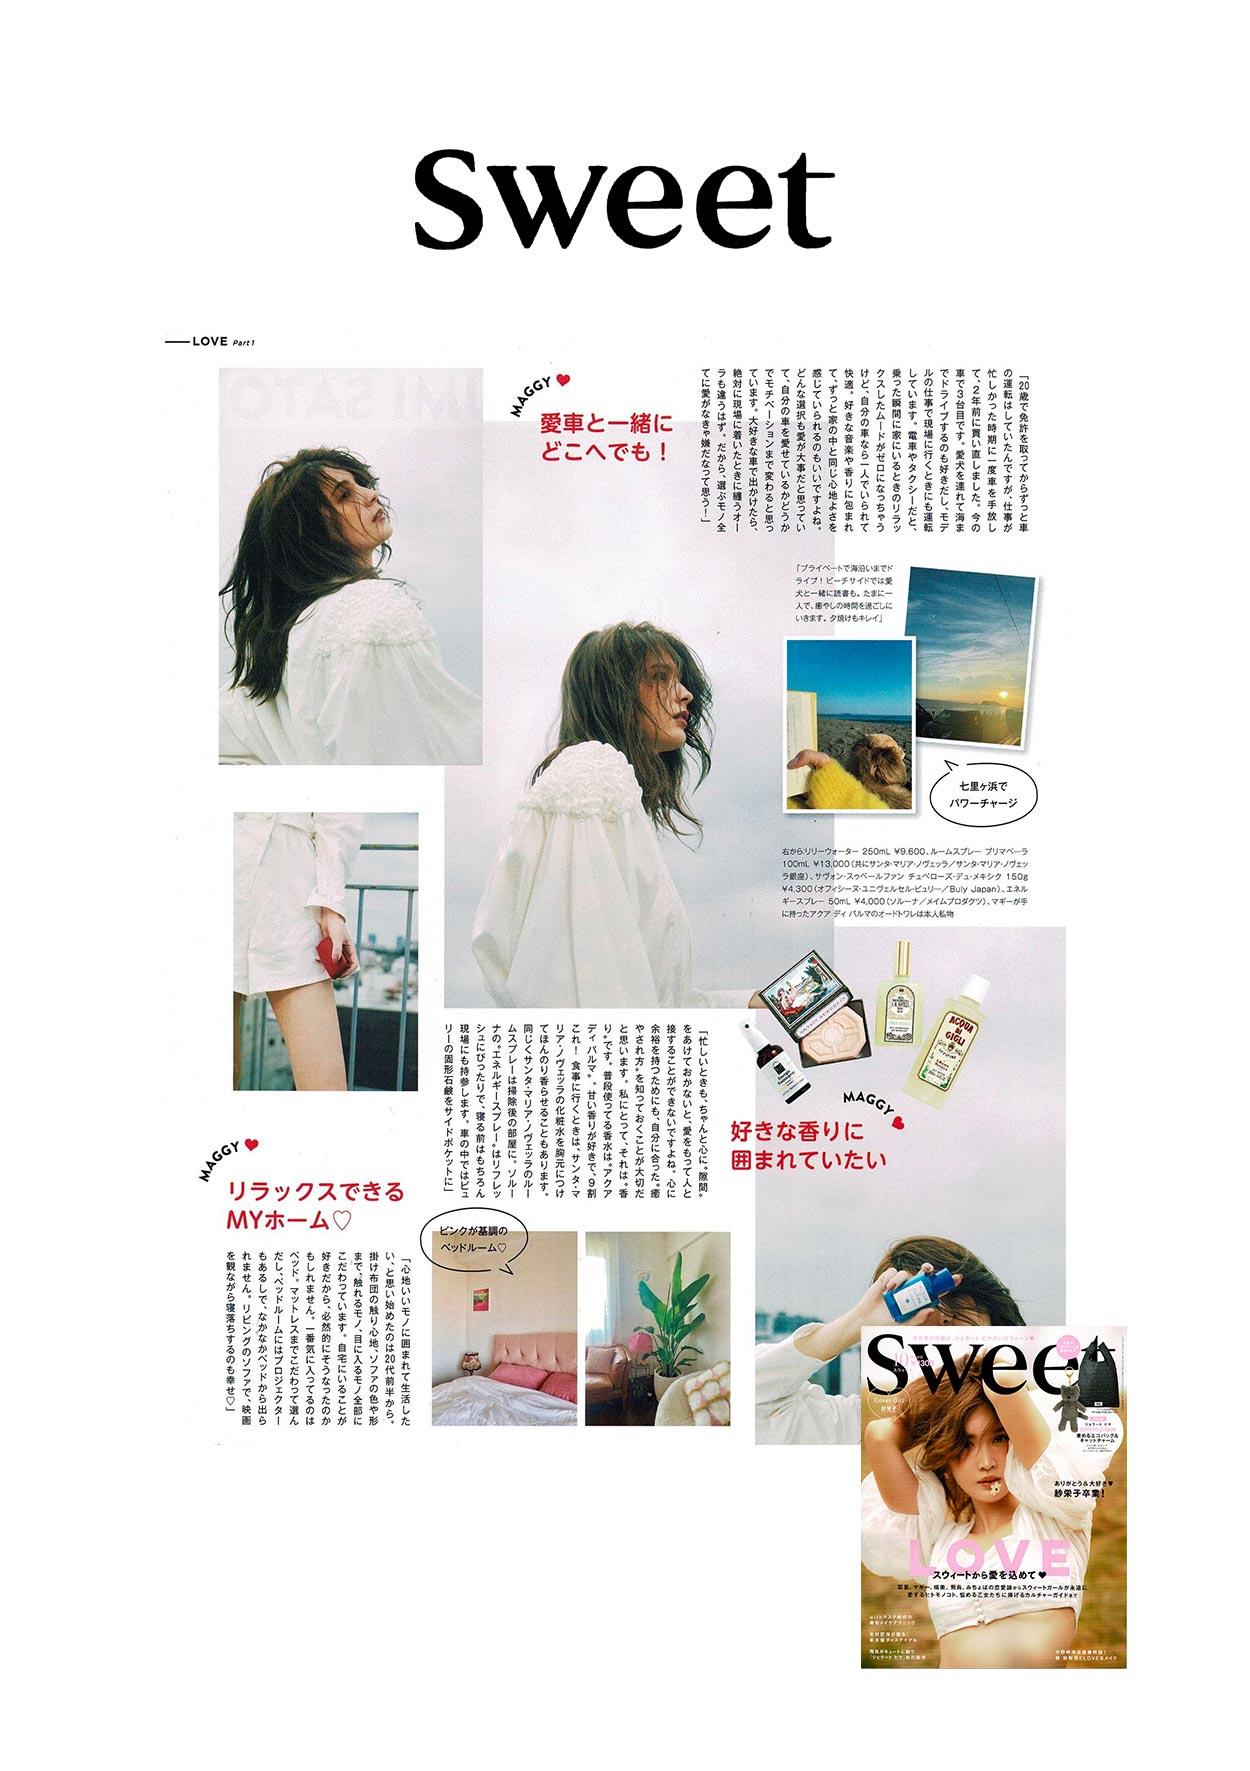 melampo press on sweet Japan magazine - photo 2